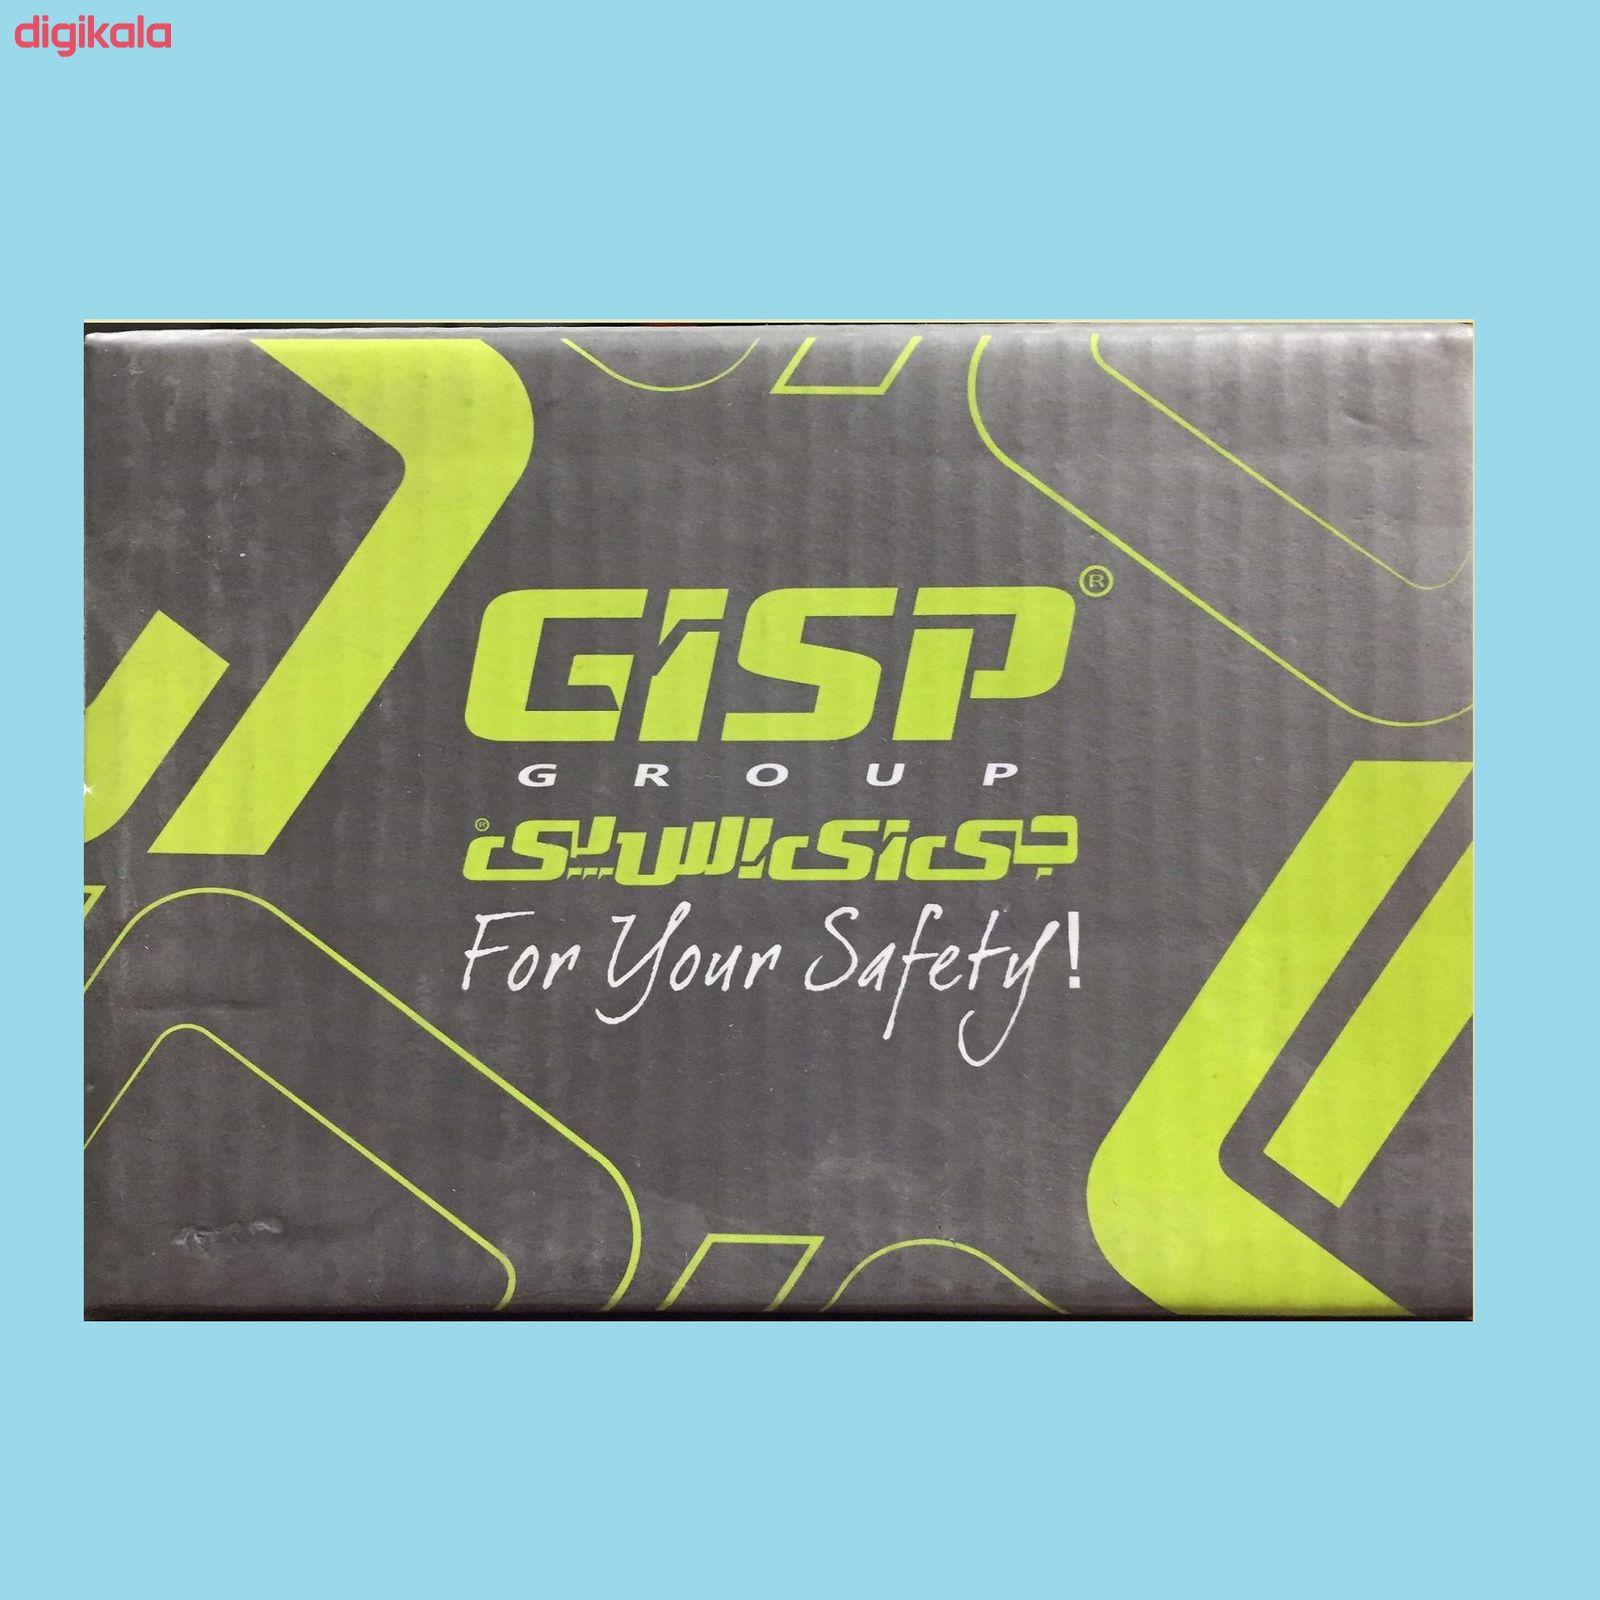 بوش پیستون و گژن پین جی آی اس پی کد 222953 مناسب برای پژو 206/تیپ 2 مجموعه 4 عددی main 1 1